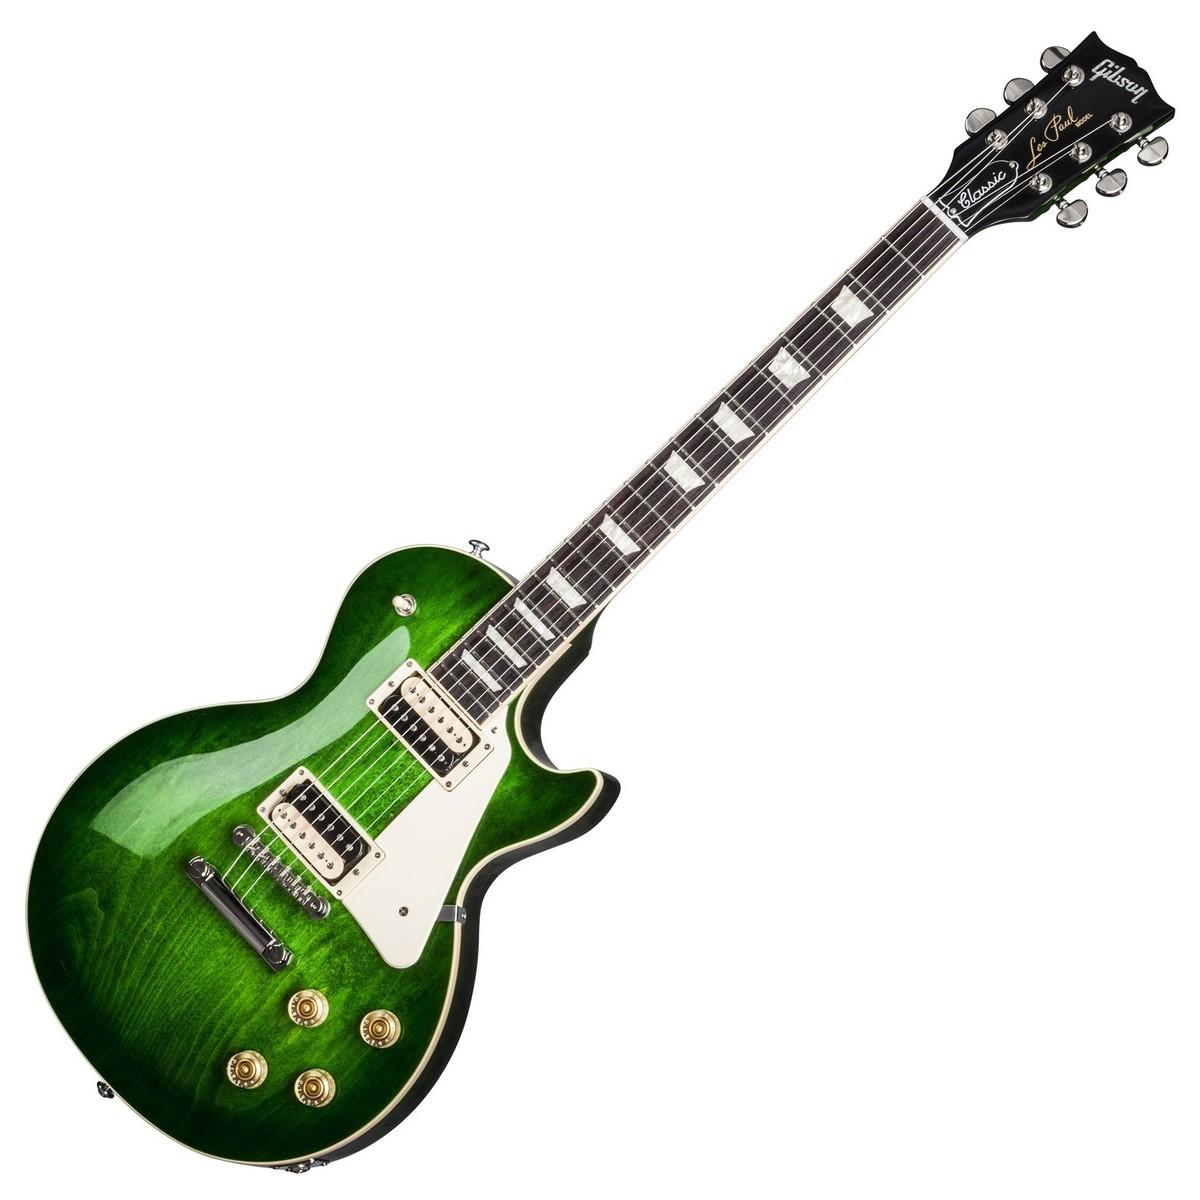 gibson les paul classic t electric guitar green ocean burst 2017 at. Black Bedroom Furniture Sets. Home Design Ideas